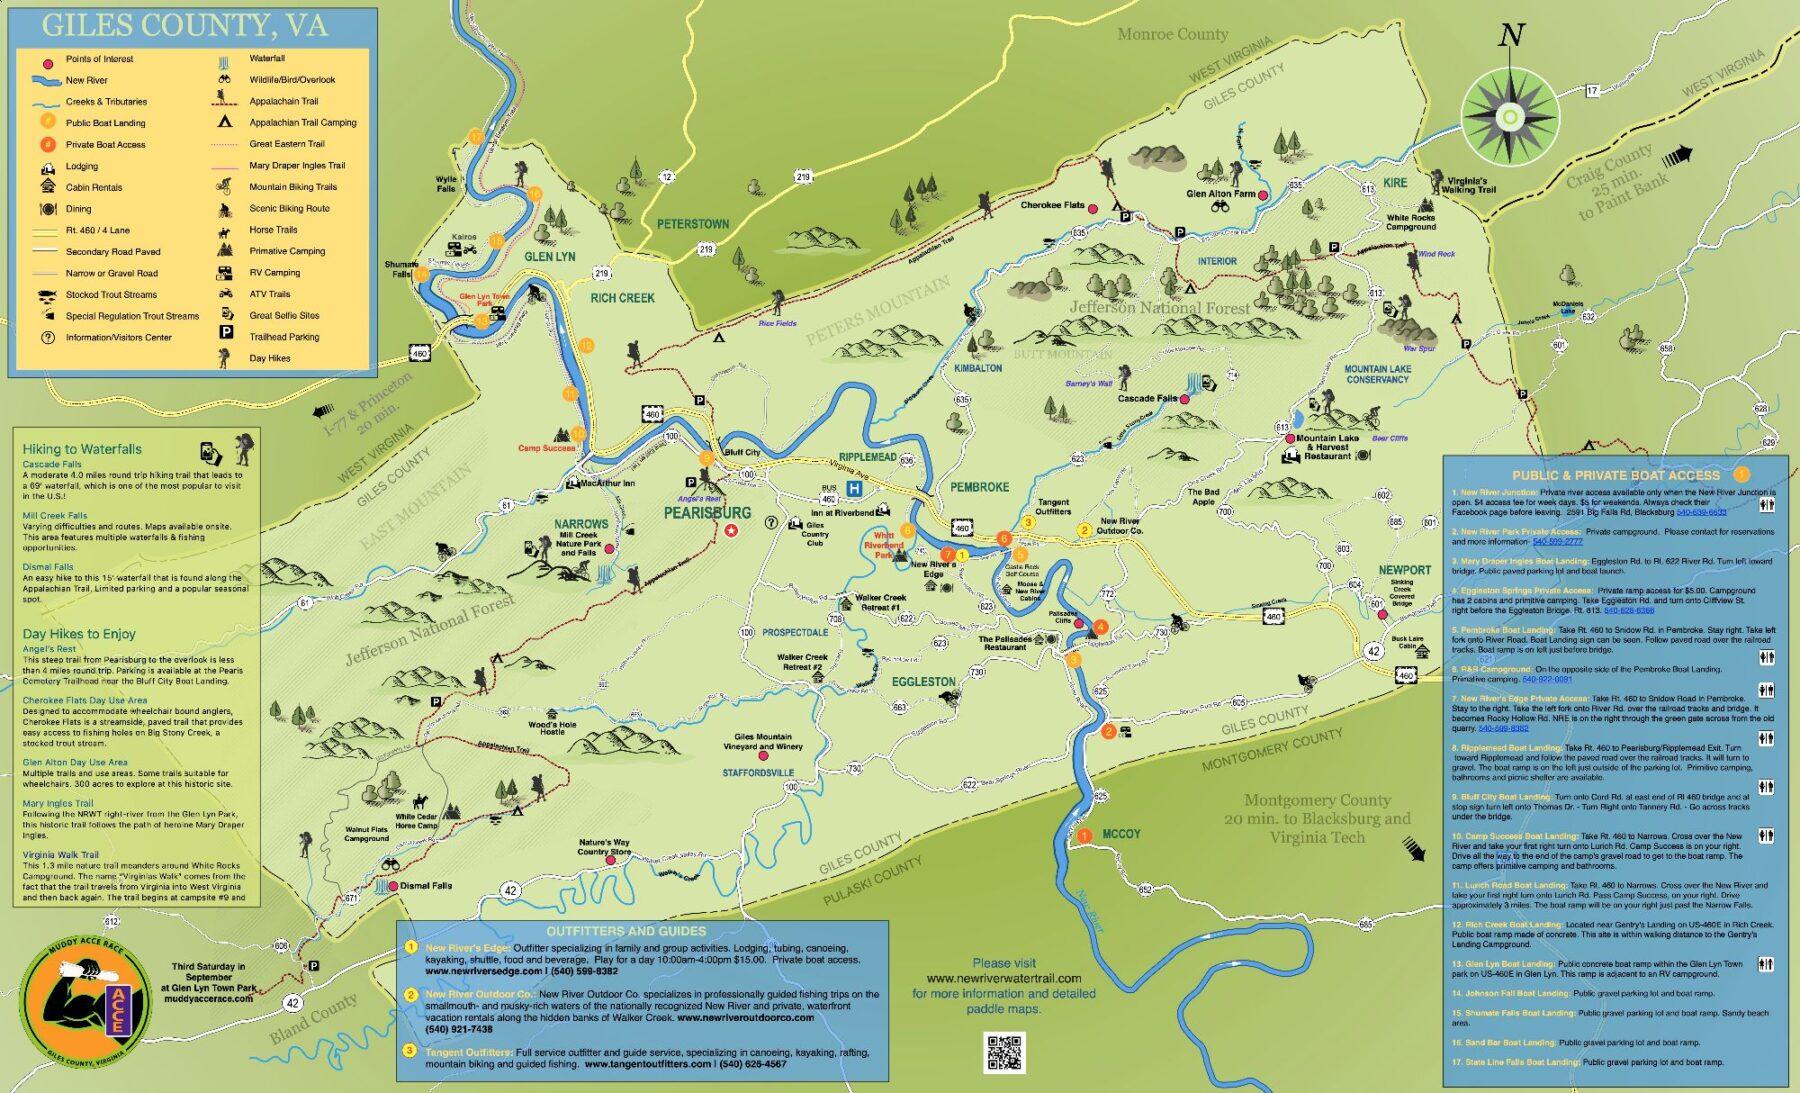 Giles county Map